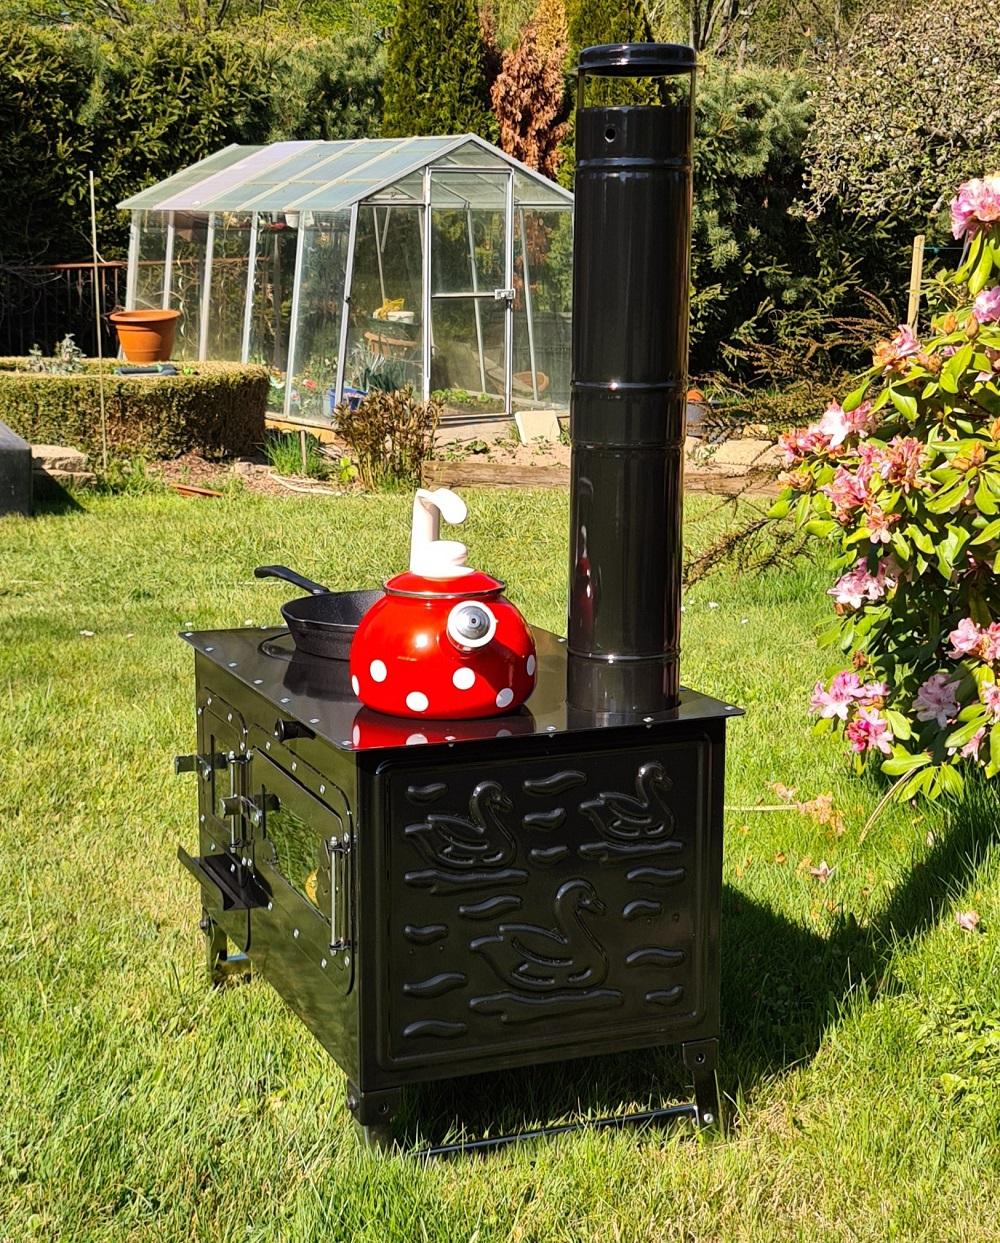 Outdoor Kuchenofen Garten Kamin Gartenkuche Rosalie Pizzaofen Zeltofen Gulaschkanone Terrassenofen